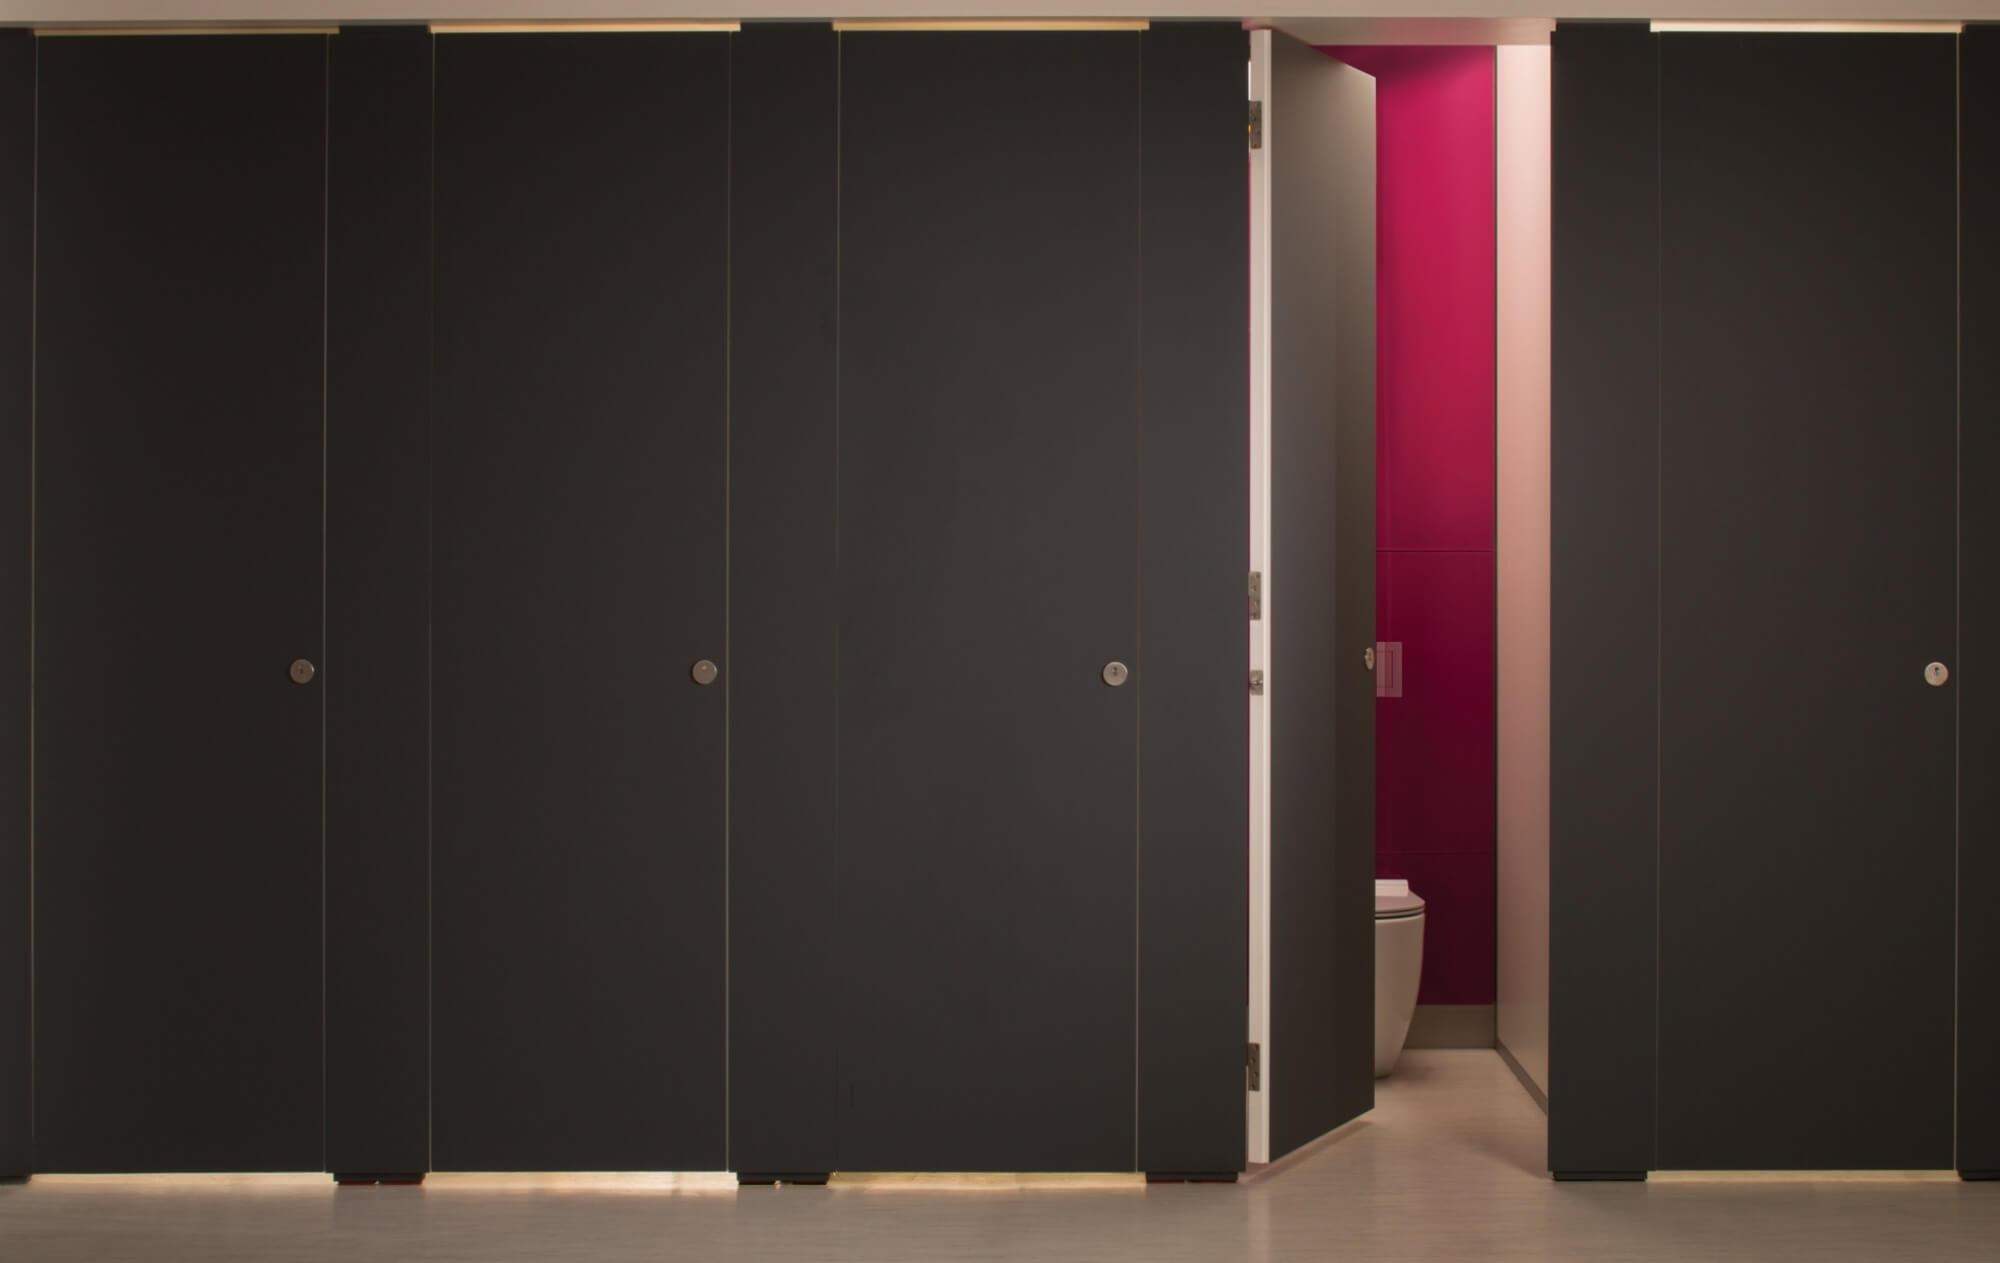 cubicles_00_fenixntm